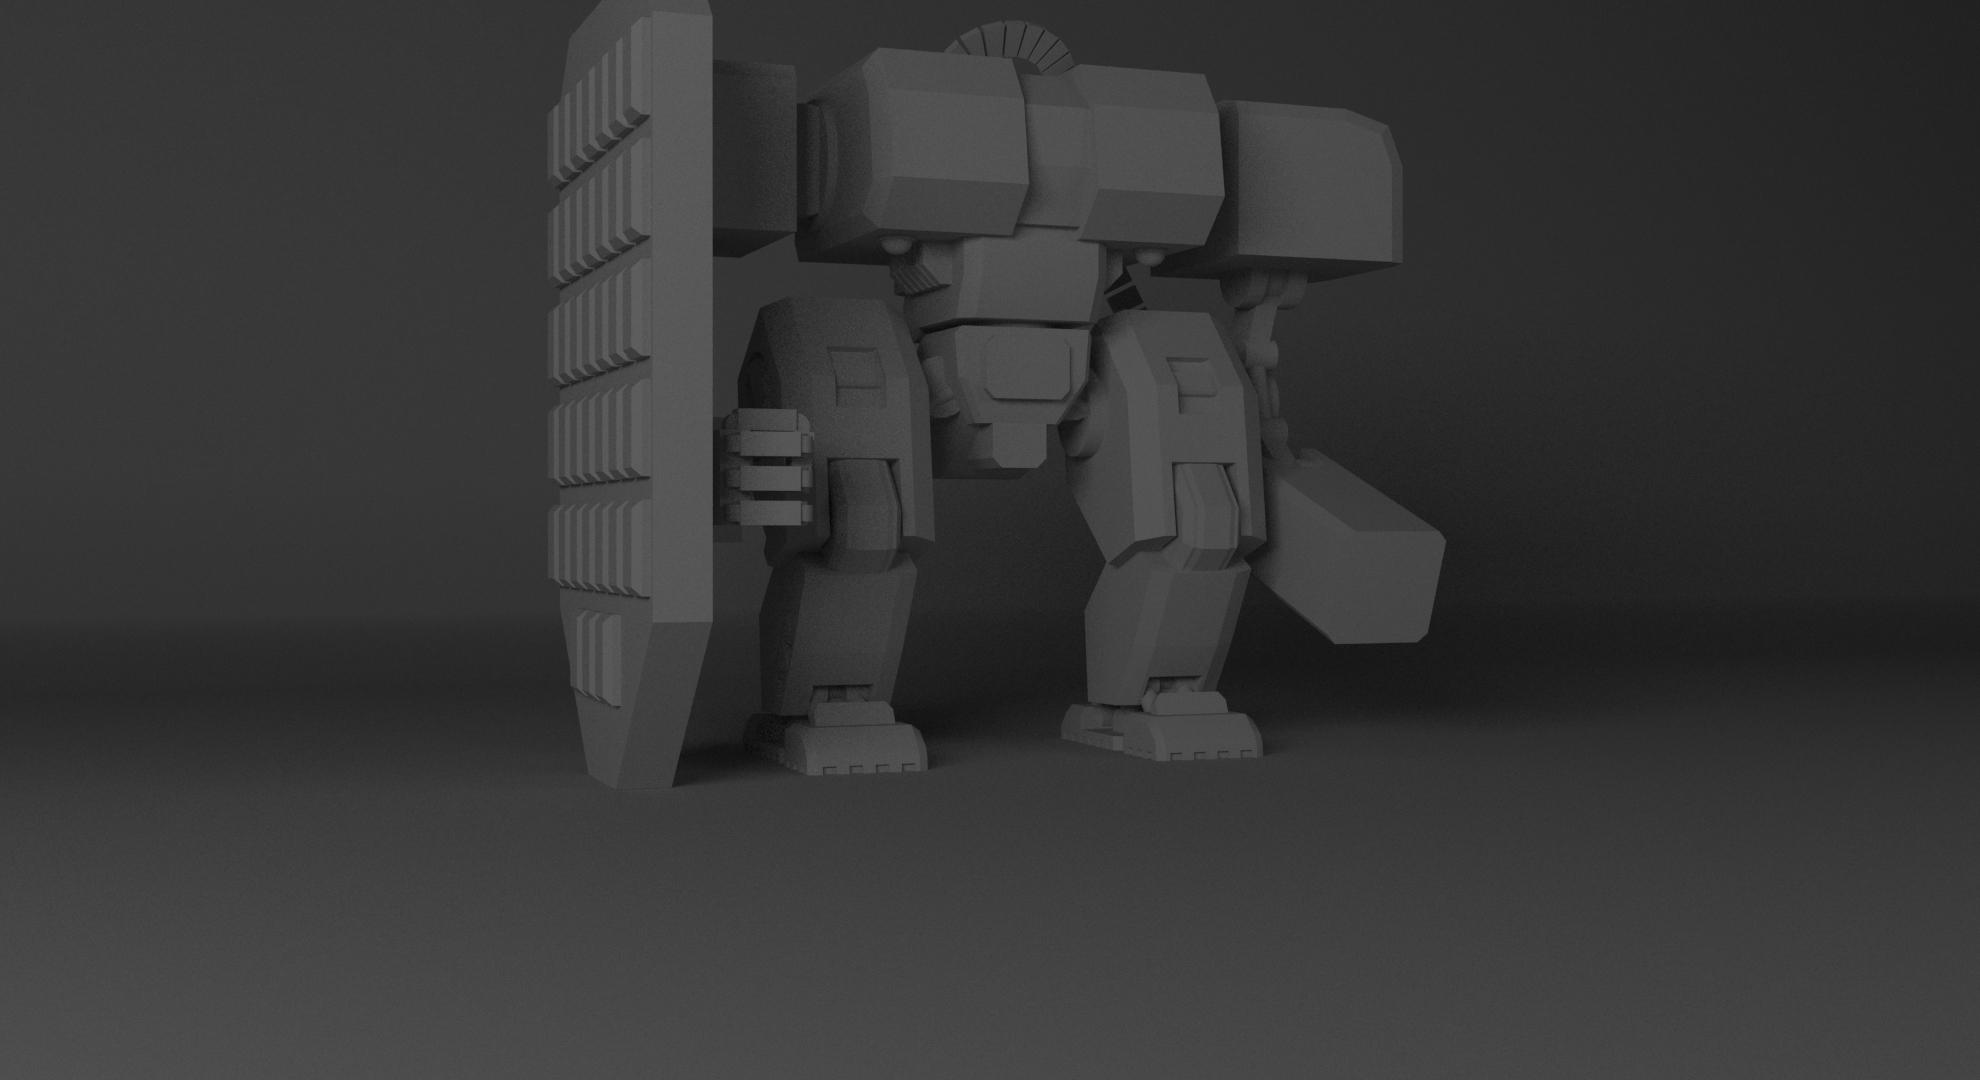 Centurion_3.jpg